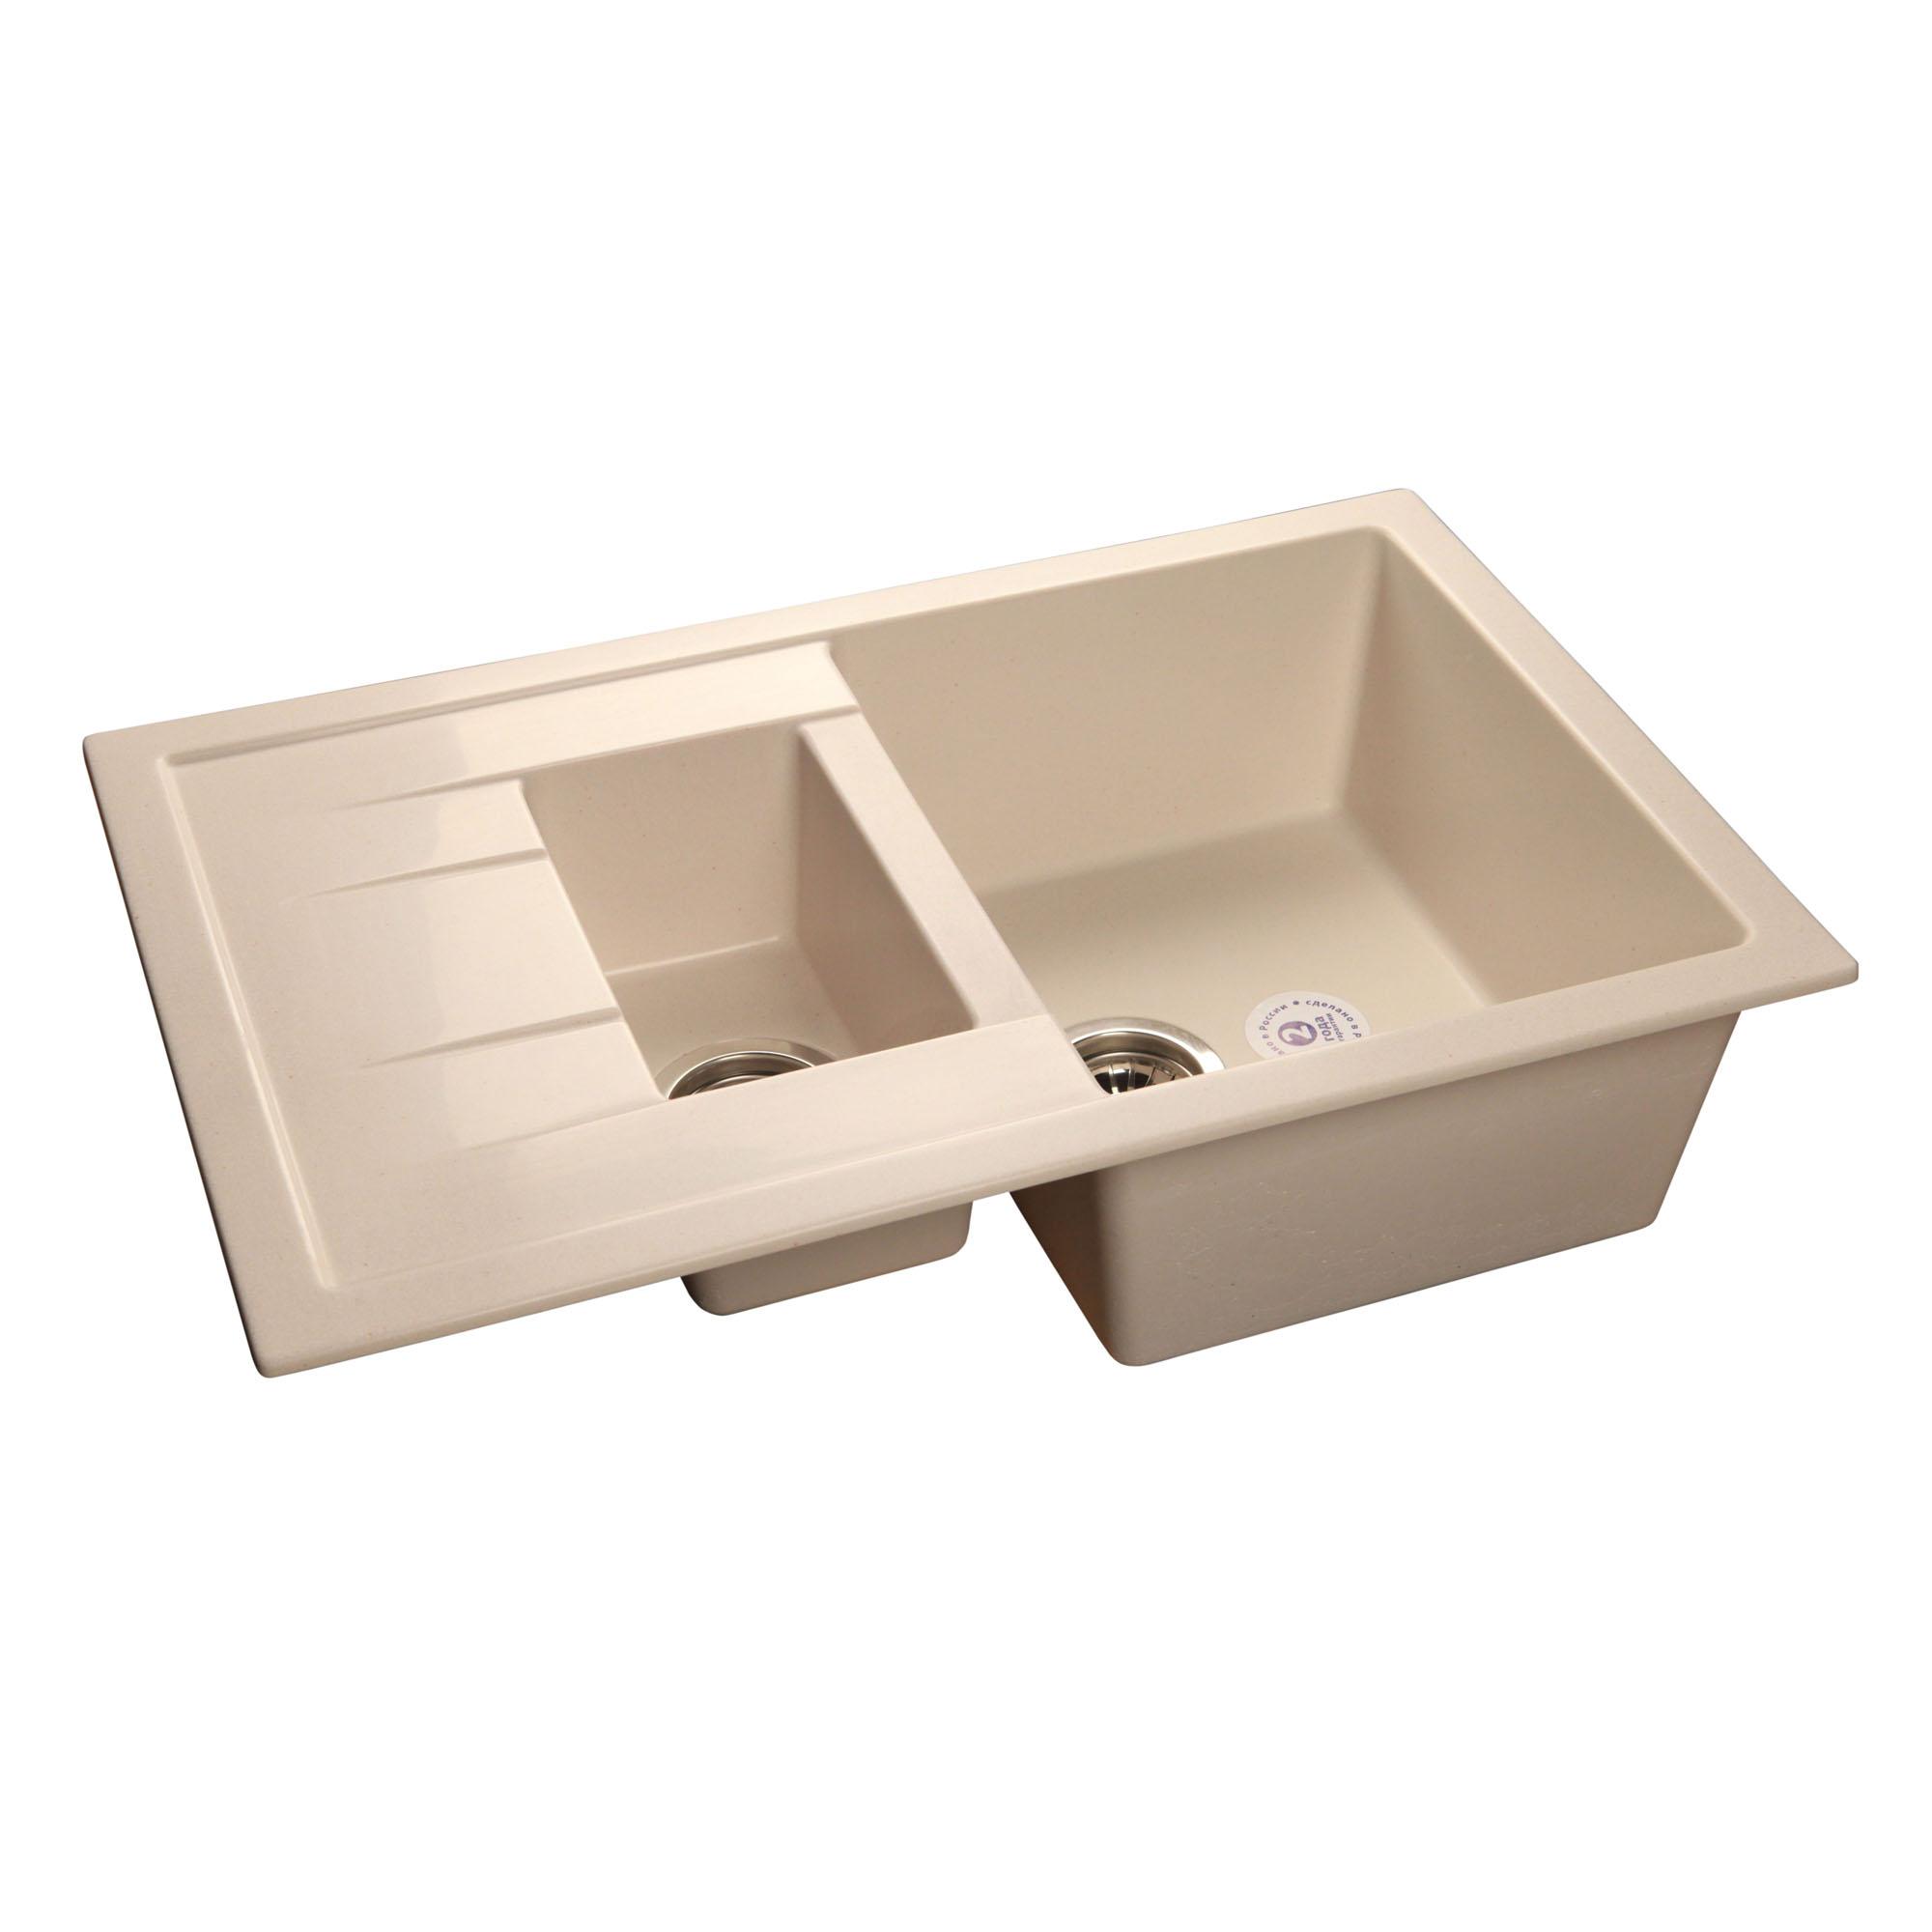 Кухонная мойка GranFest Quadro GF-Q775KL белый мойка кухонная weissgauff quadro 800 eco granit белый